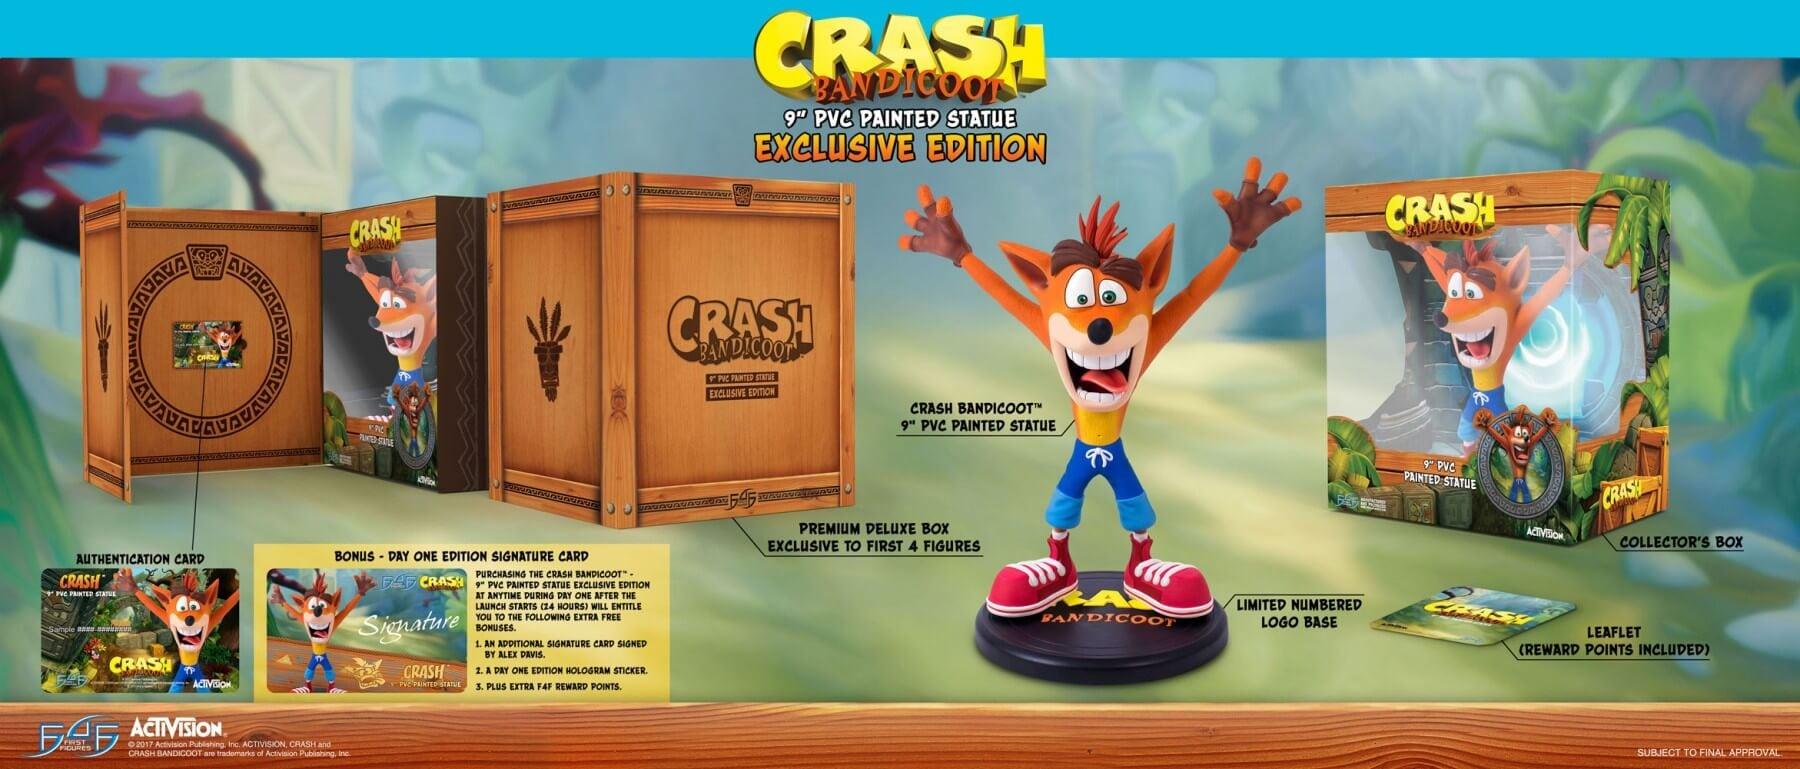 crash bandicoot figurka 02 - Kolekcjonerskie figurki Spyro the Dragon oraz Crash Bandicoot od First 4 Figures!